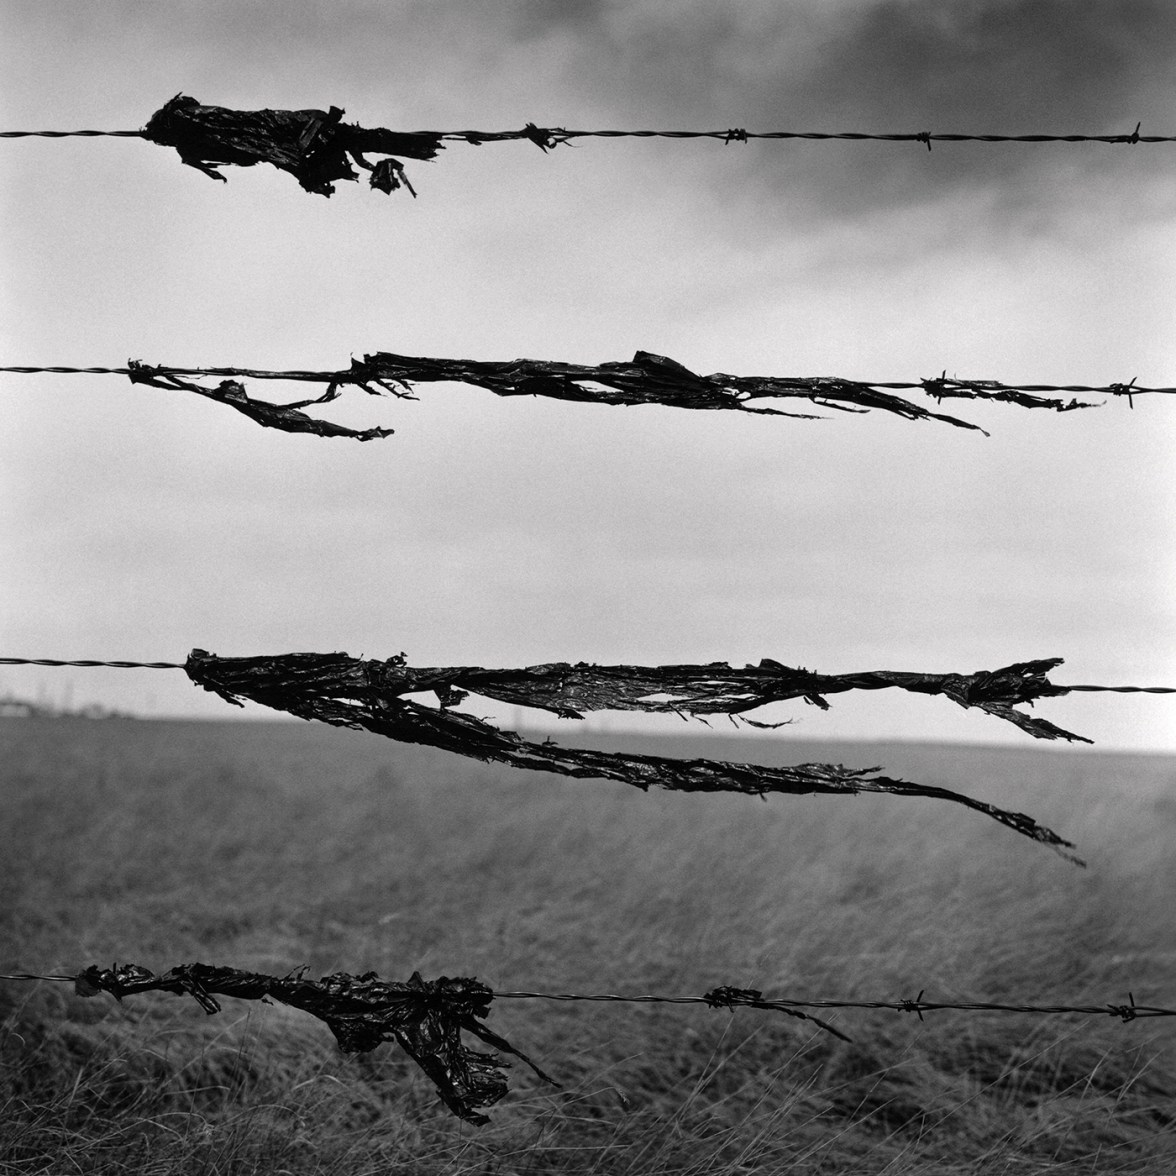 Snag 6 © Wes Bell